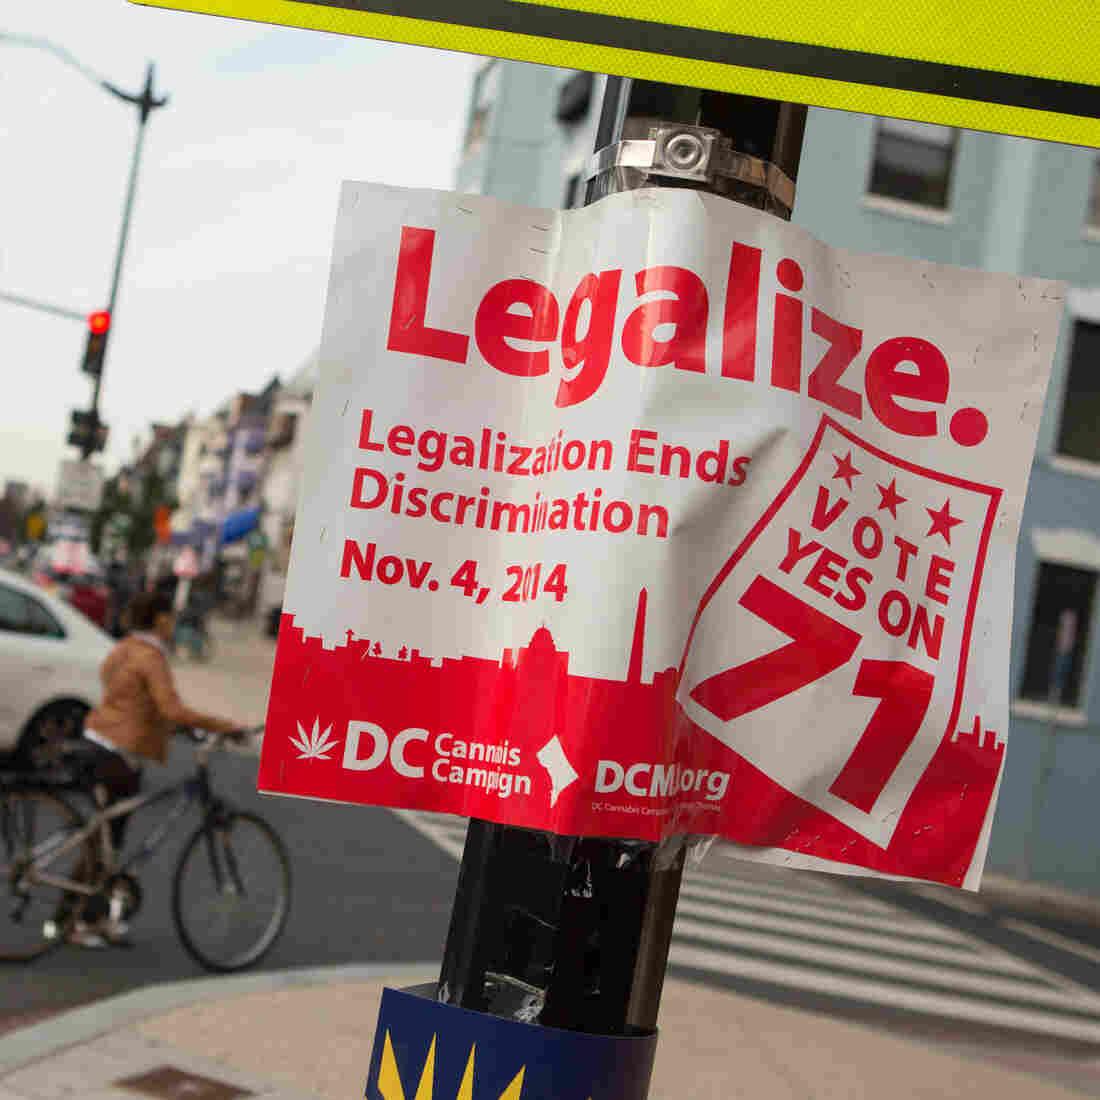 Marijuana Votes: Oregon And D.C. Legalize; Florida Says No To Medical